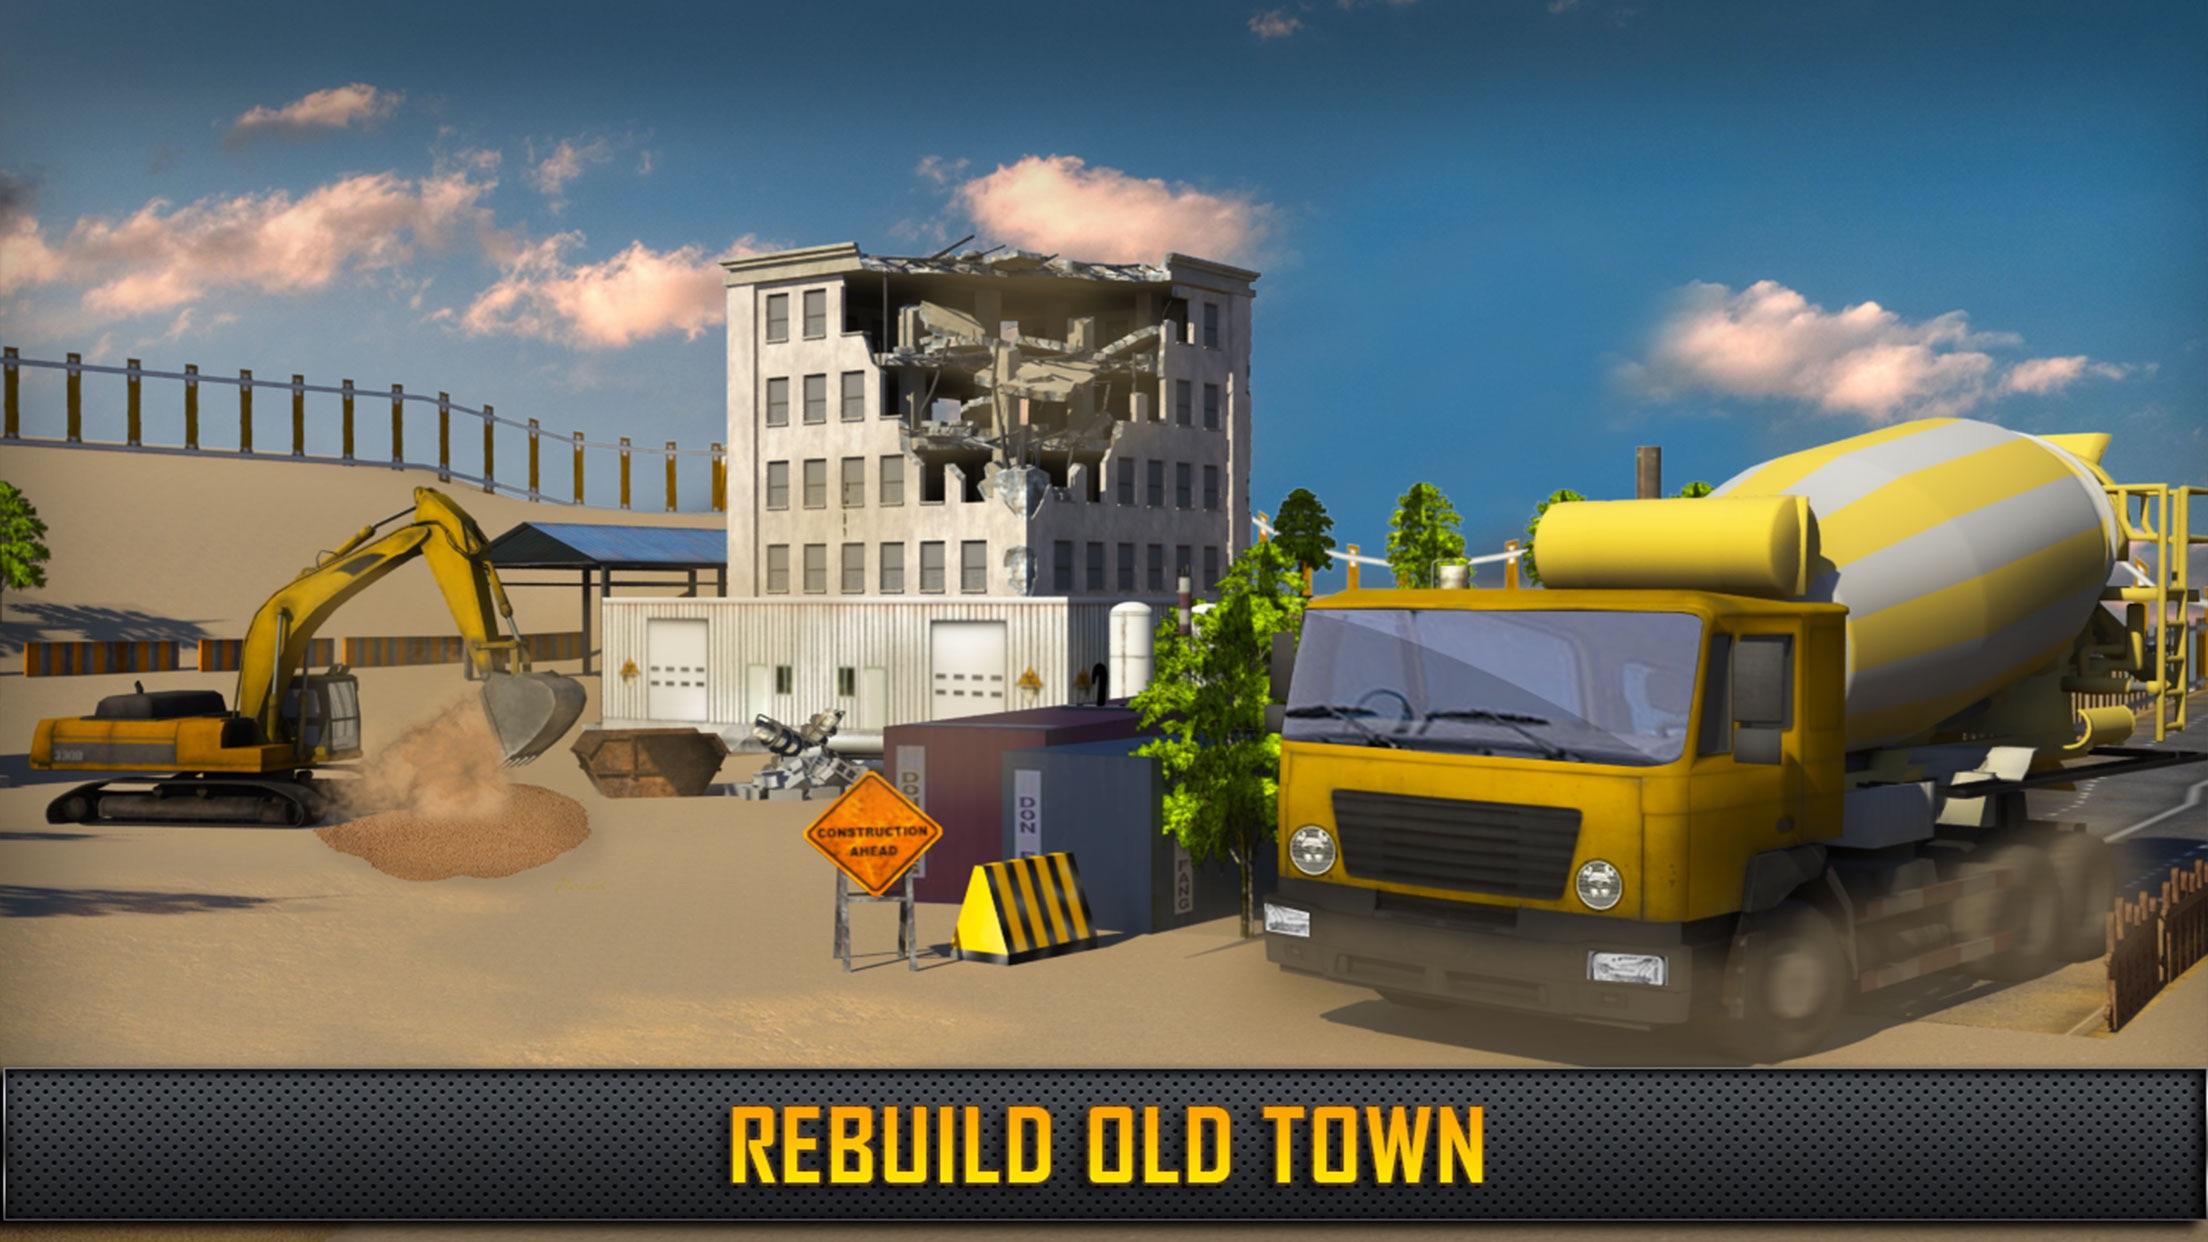 Hill Construction Crane Operator & Truck Driver 3D by Waqas AkramHill Construction Crane Operator & Truck Driver 3D